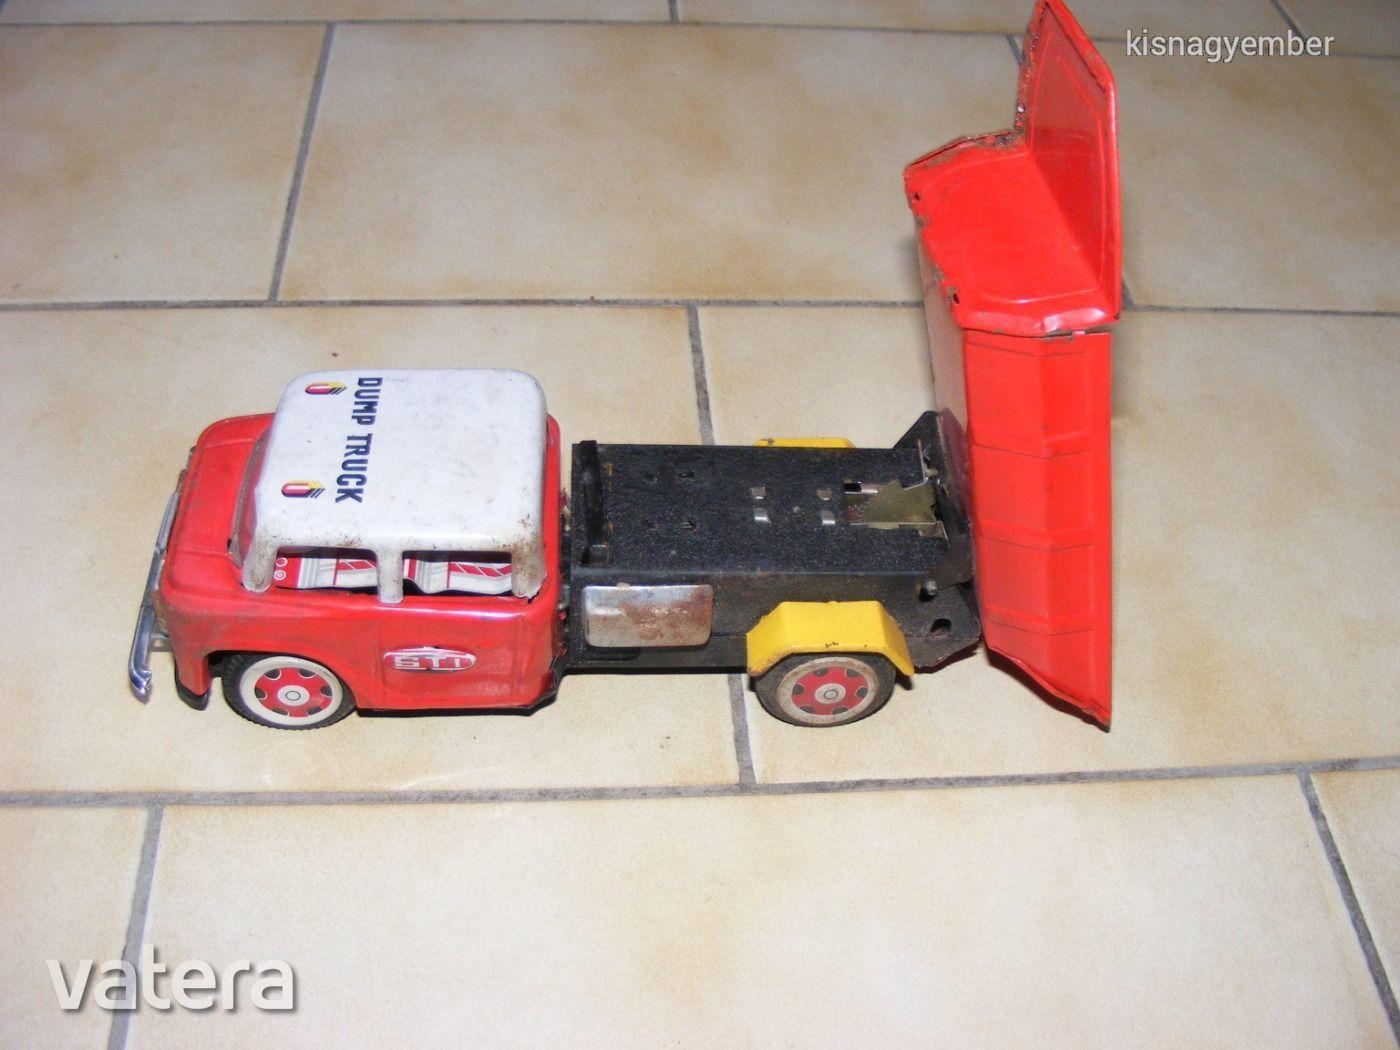 retro-dump-truck-lemez-billencs-auto-lendkerekes-1980-as-evek-b80b_3_big.jpg